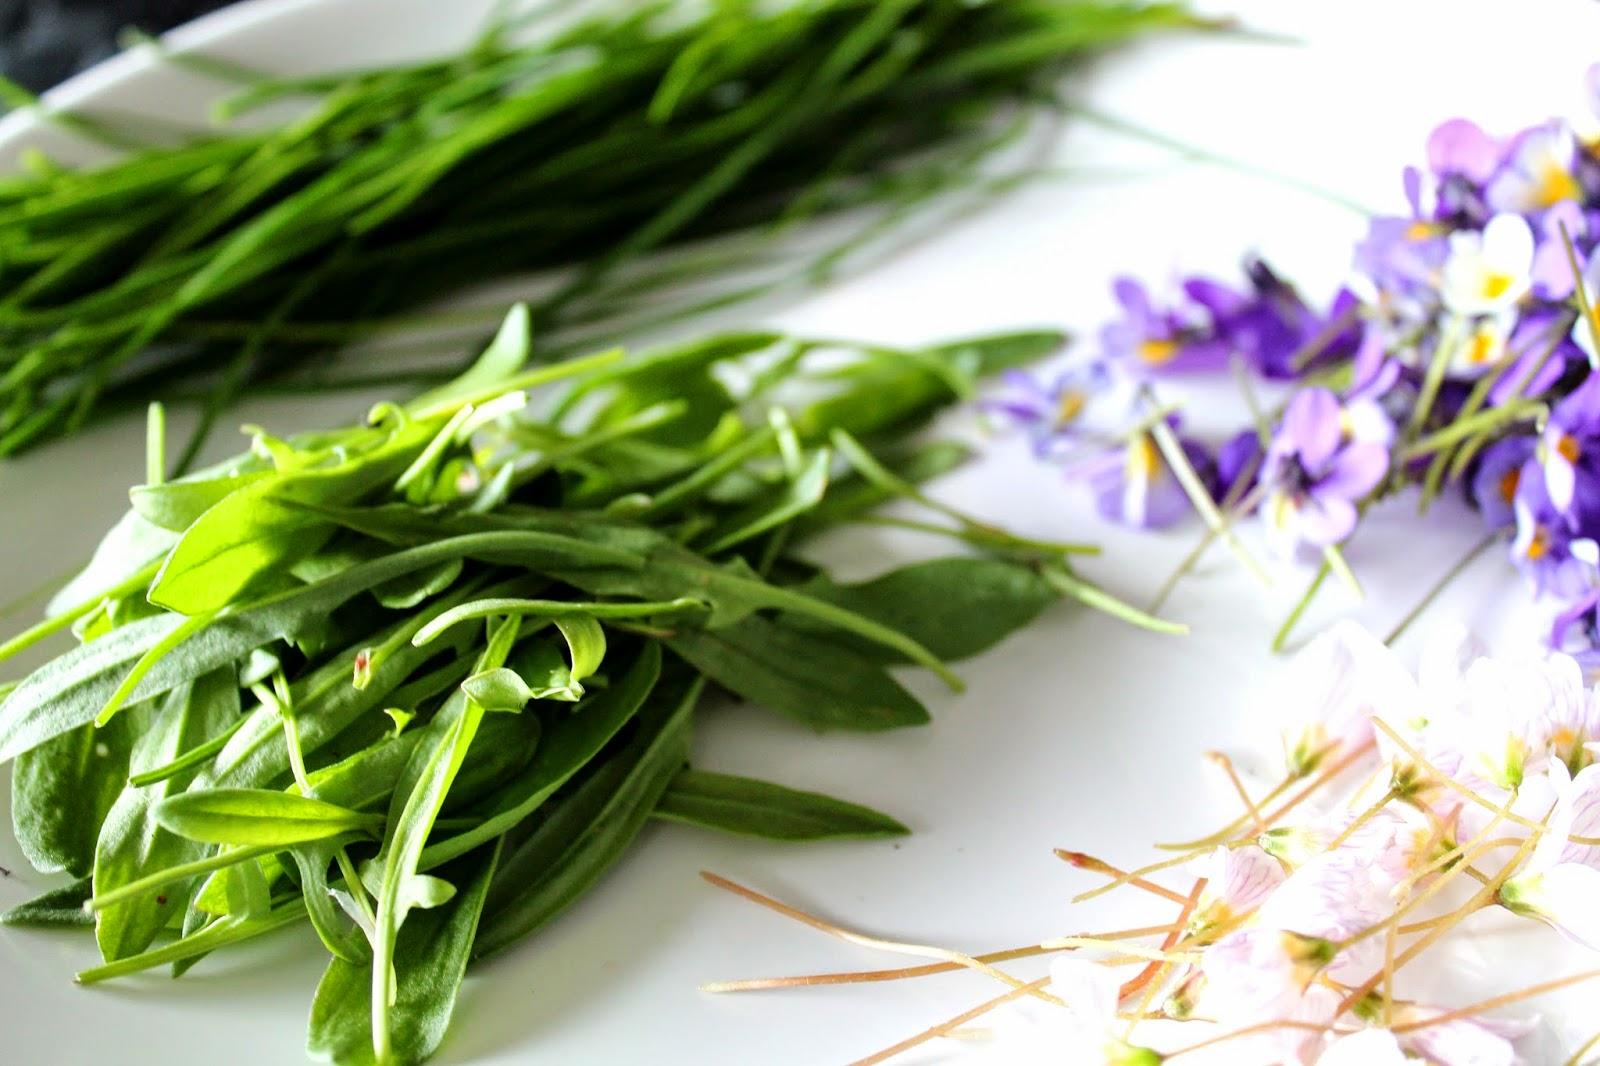 Chive, violets, wood sorrel flowers and sorrel | Alinan kotona blog